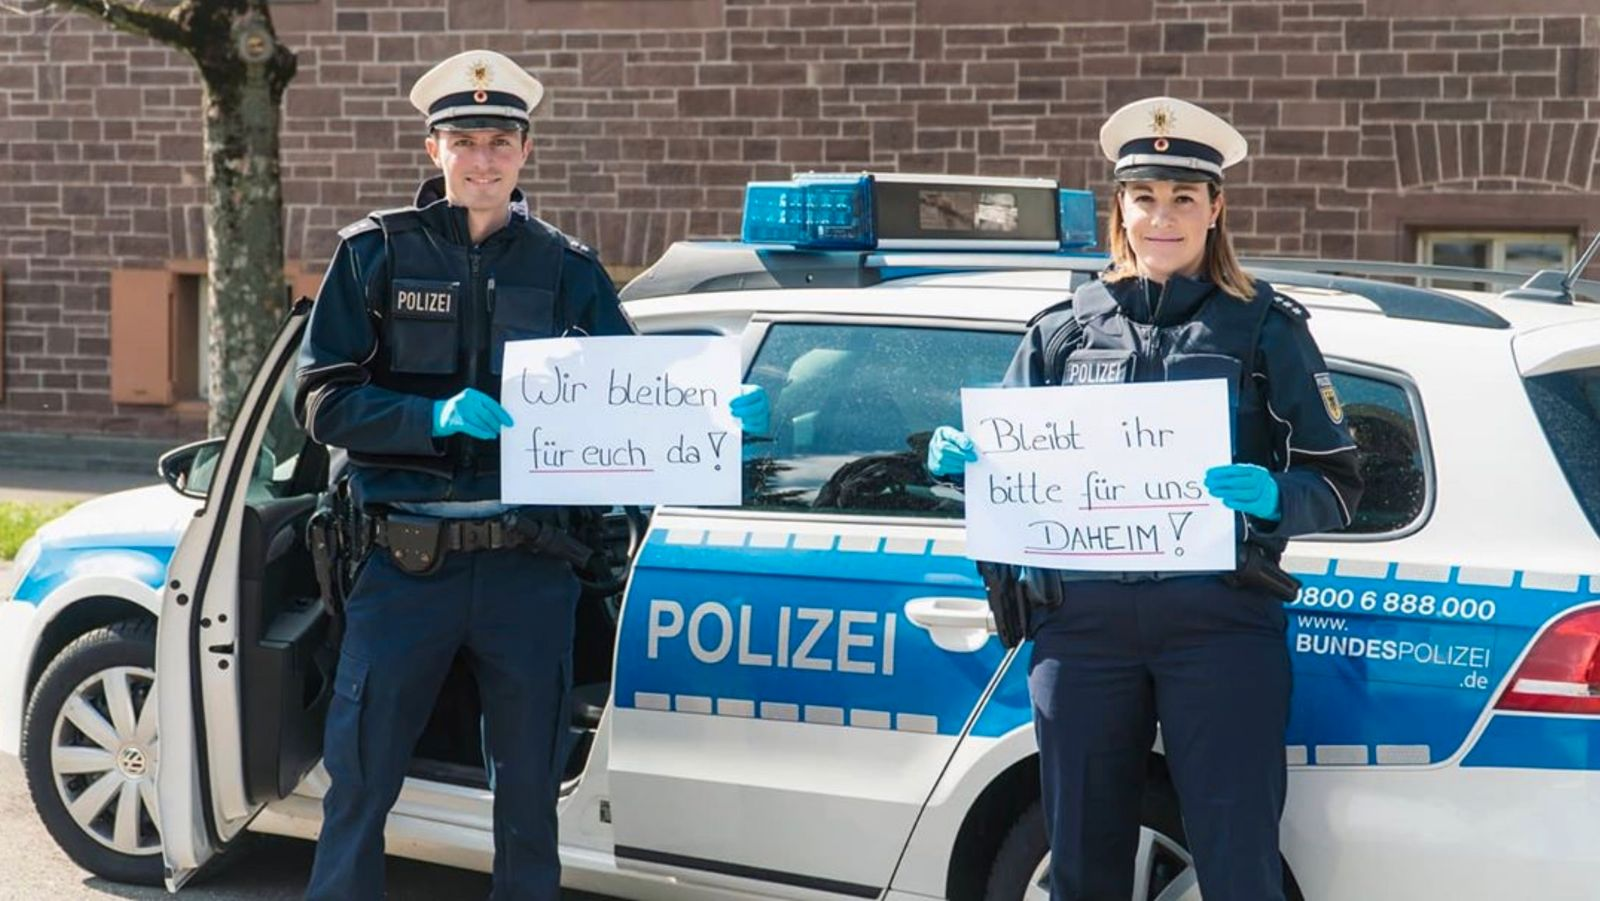 Corona-Virus/ Polizei/ Social Media